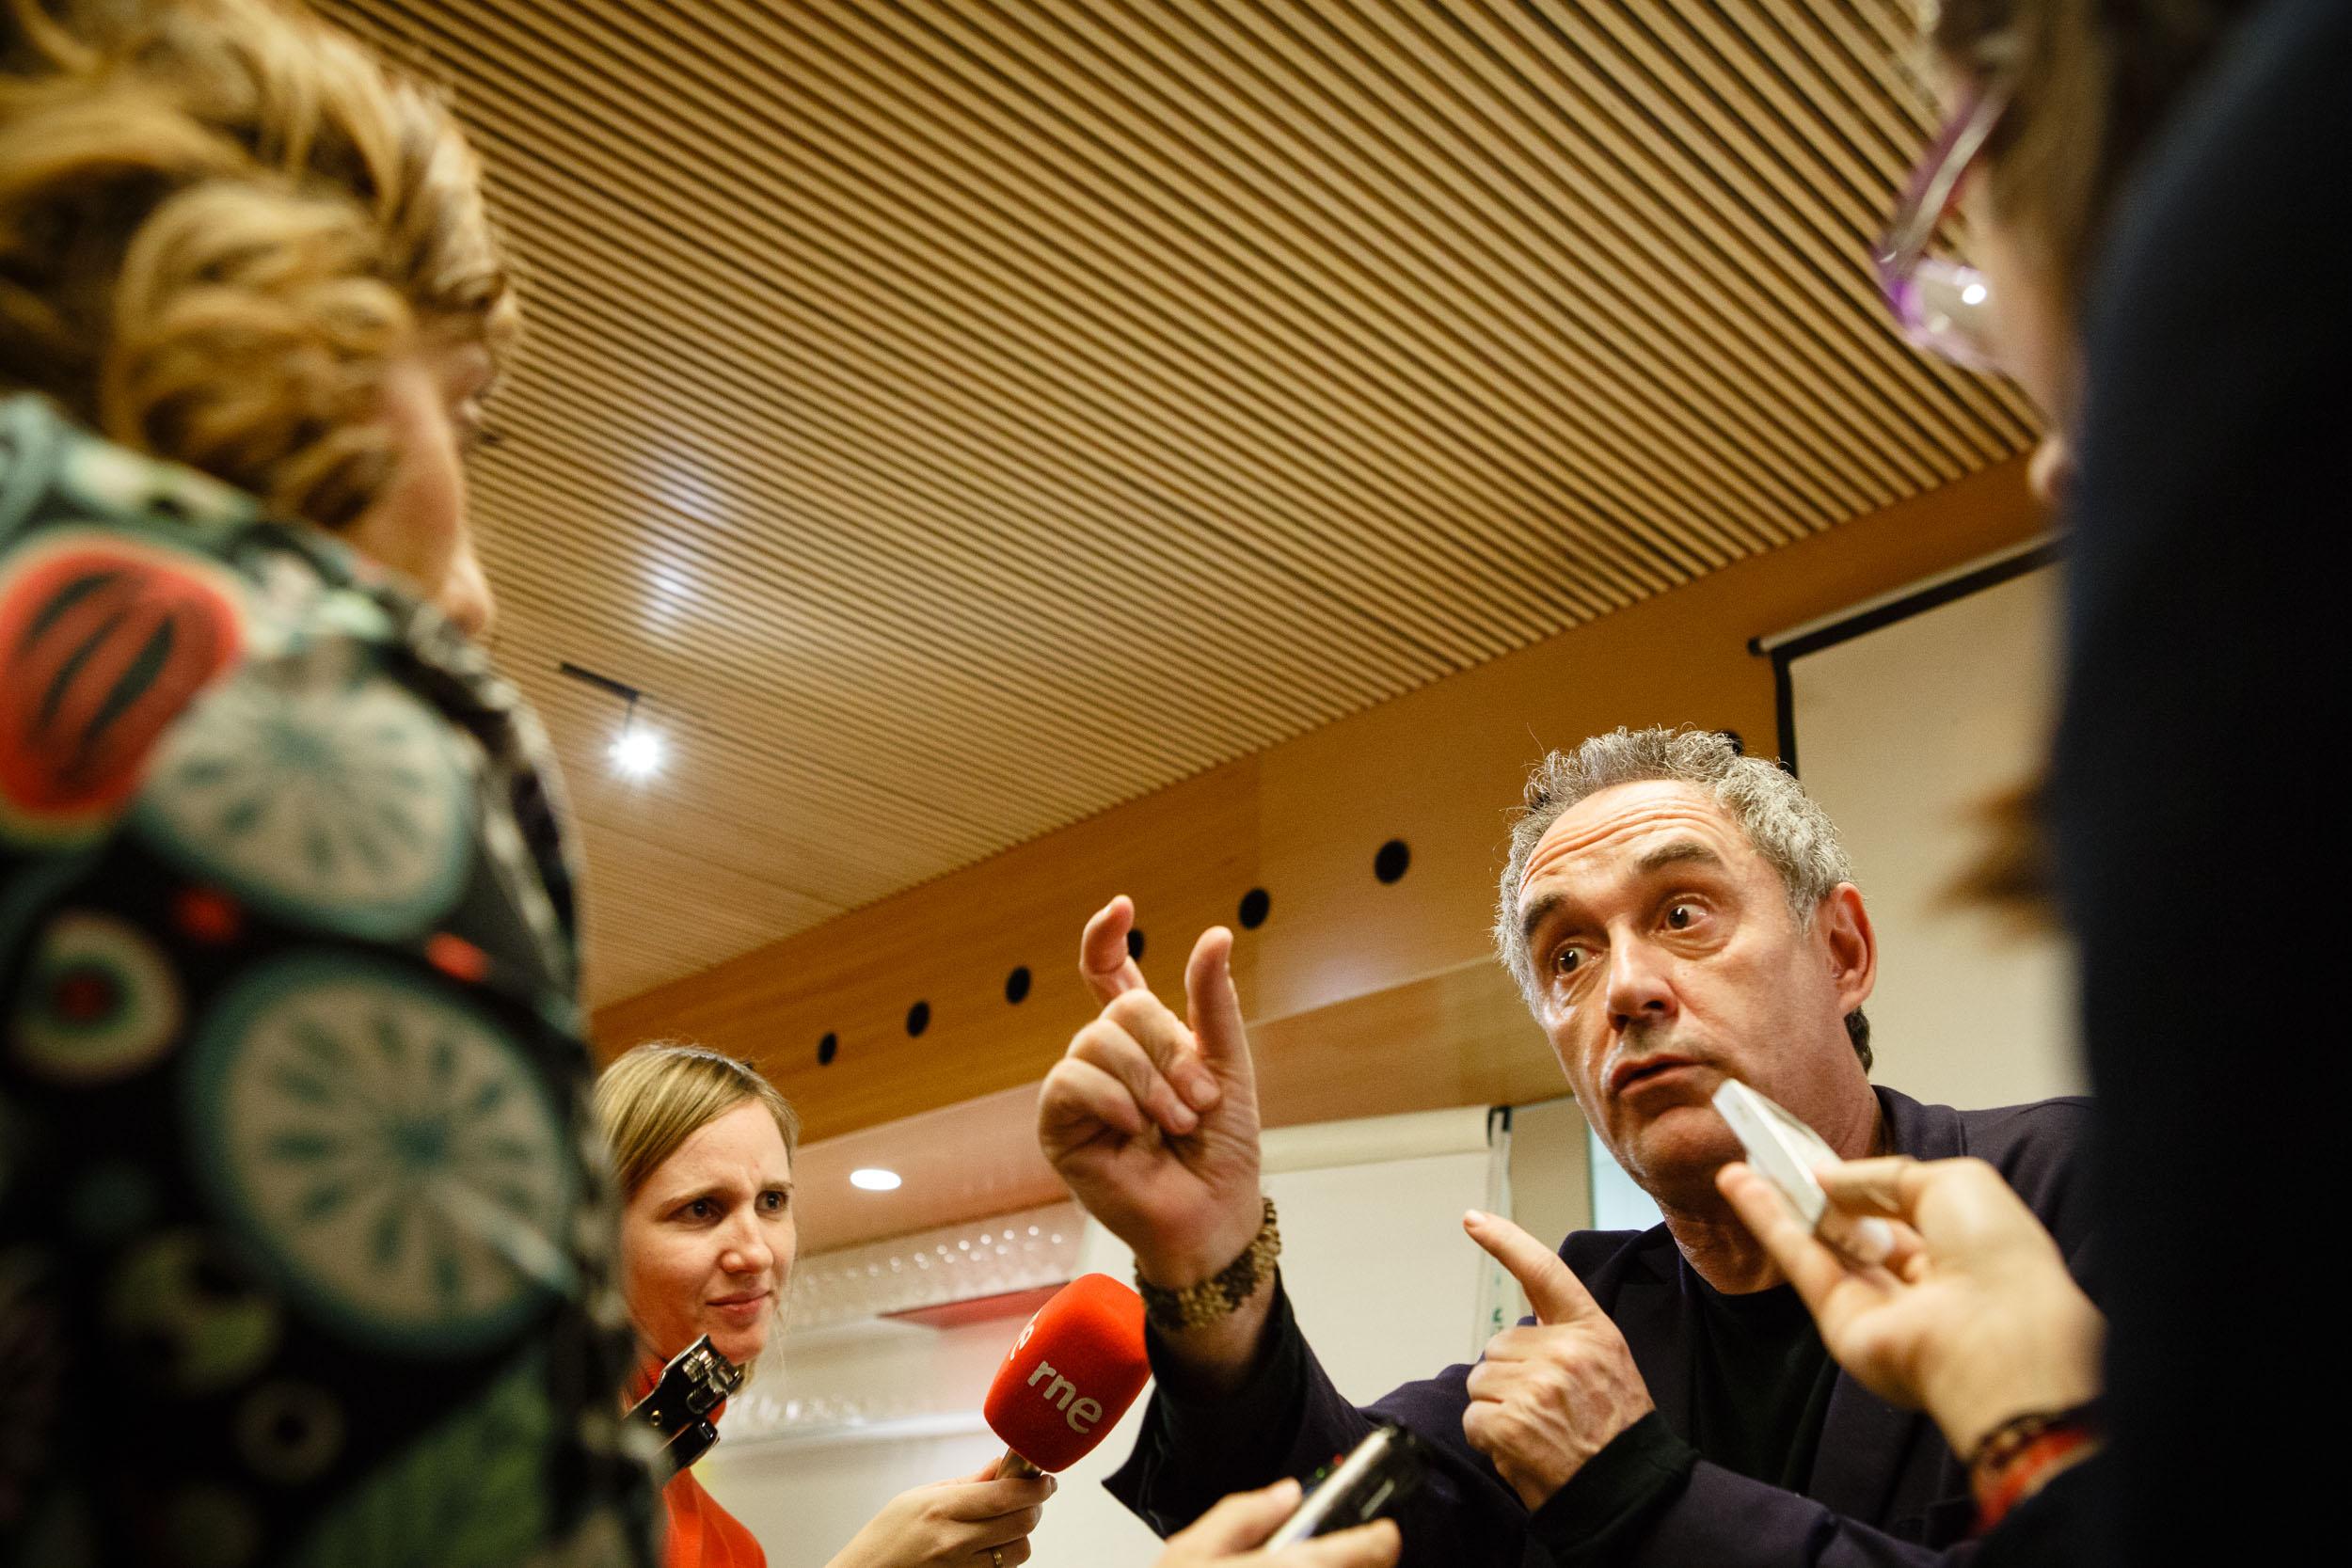 14/12/12 Chef Ferran Adrià during press conference in Restaurante Tondeluna, Logroño, La Rioja, Spain. Foto por James Sturcke | www.sturcke.org